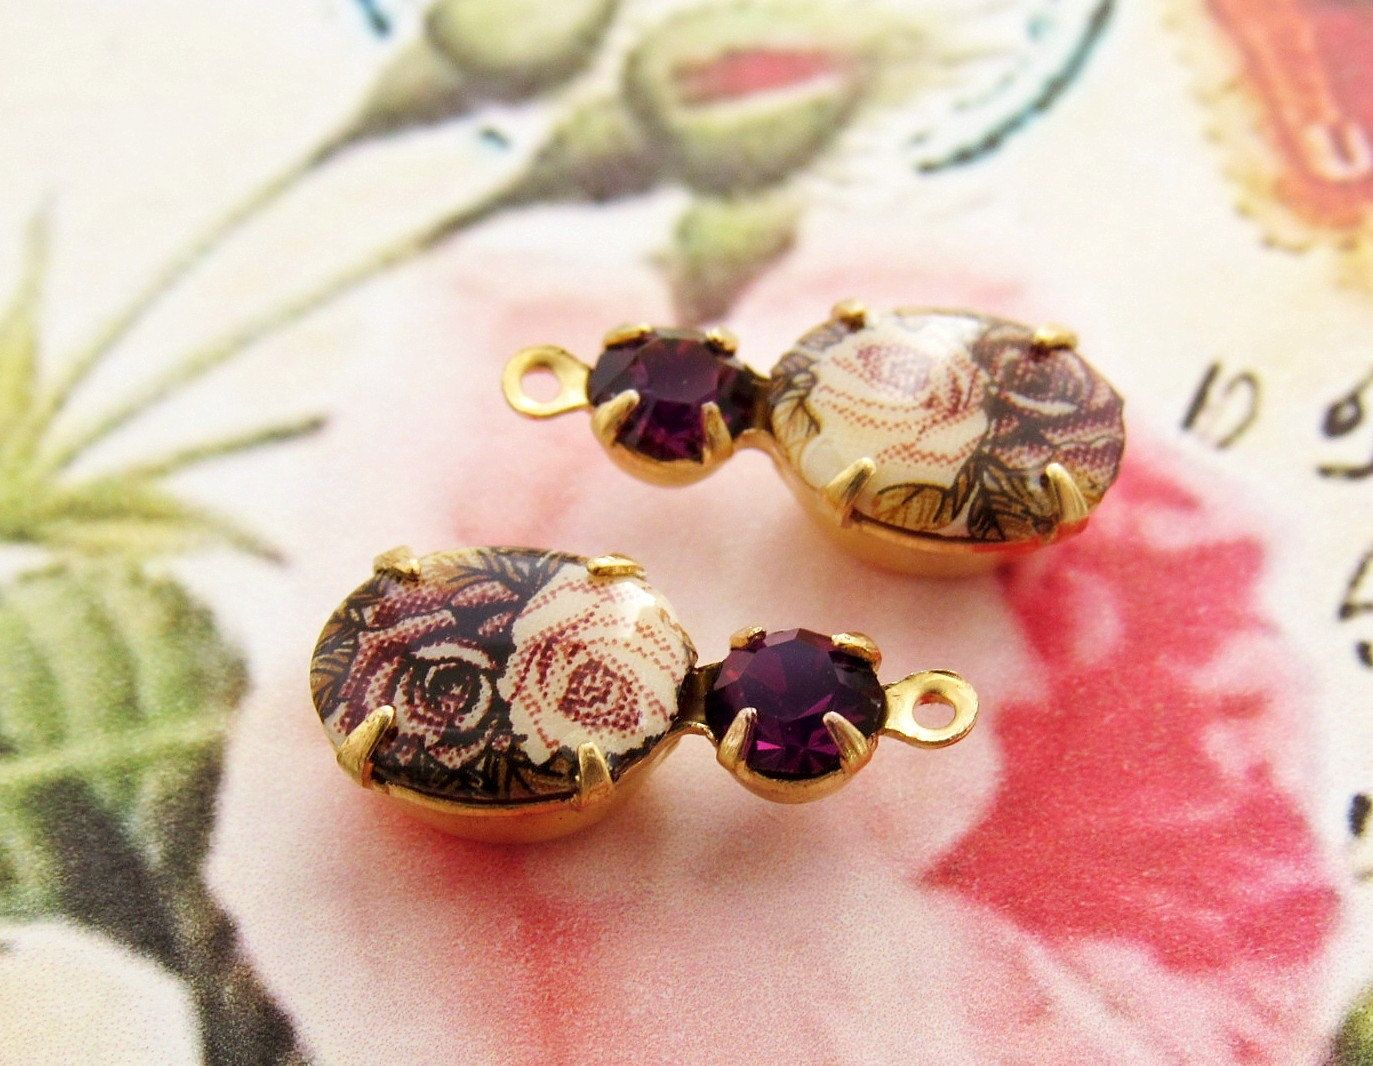 Vintage Pink & Amethyst Rose Limoge Cameo Amethyst Rhinestone Drops Brass 1 Ring or 2 Ring Settings by alyssabethsvintage on Etsy